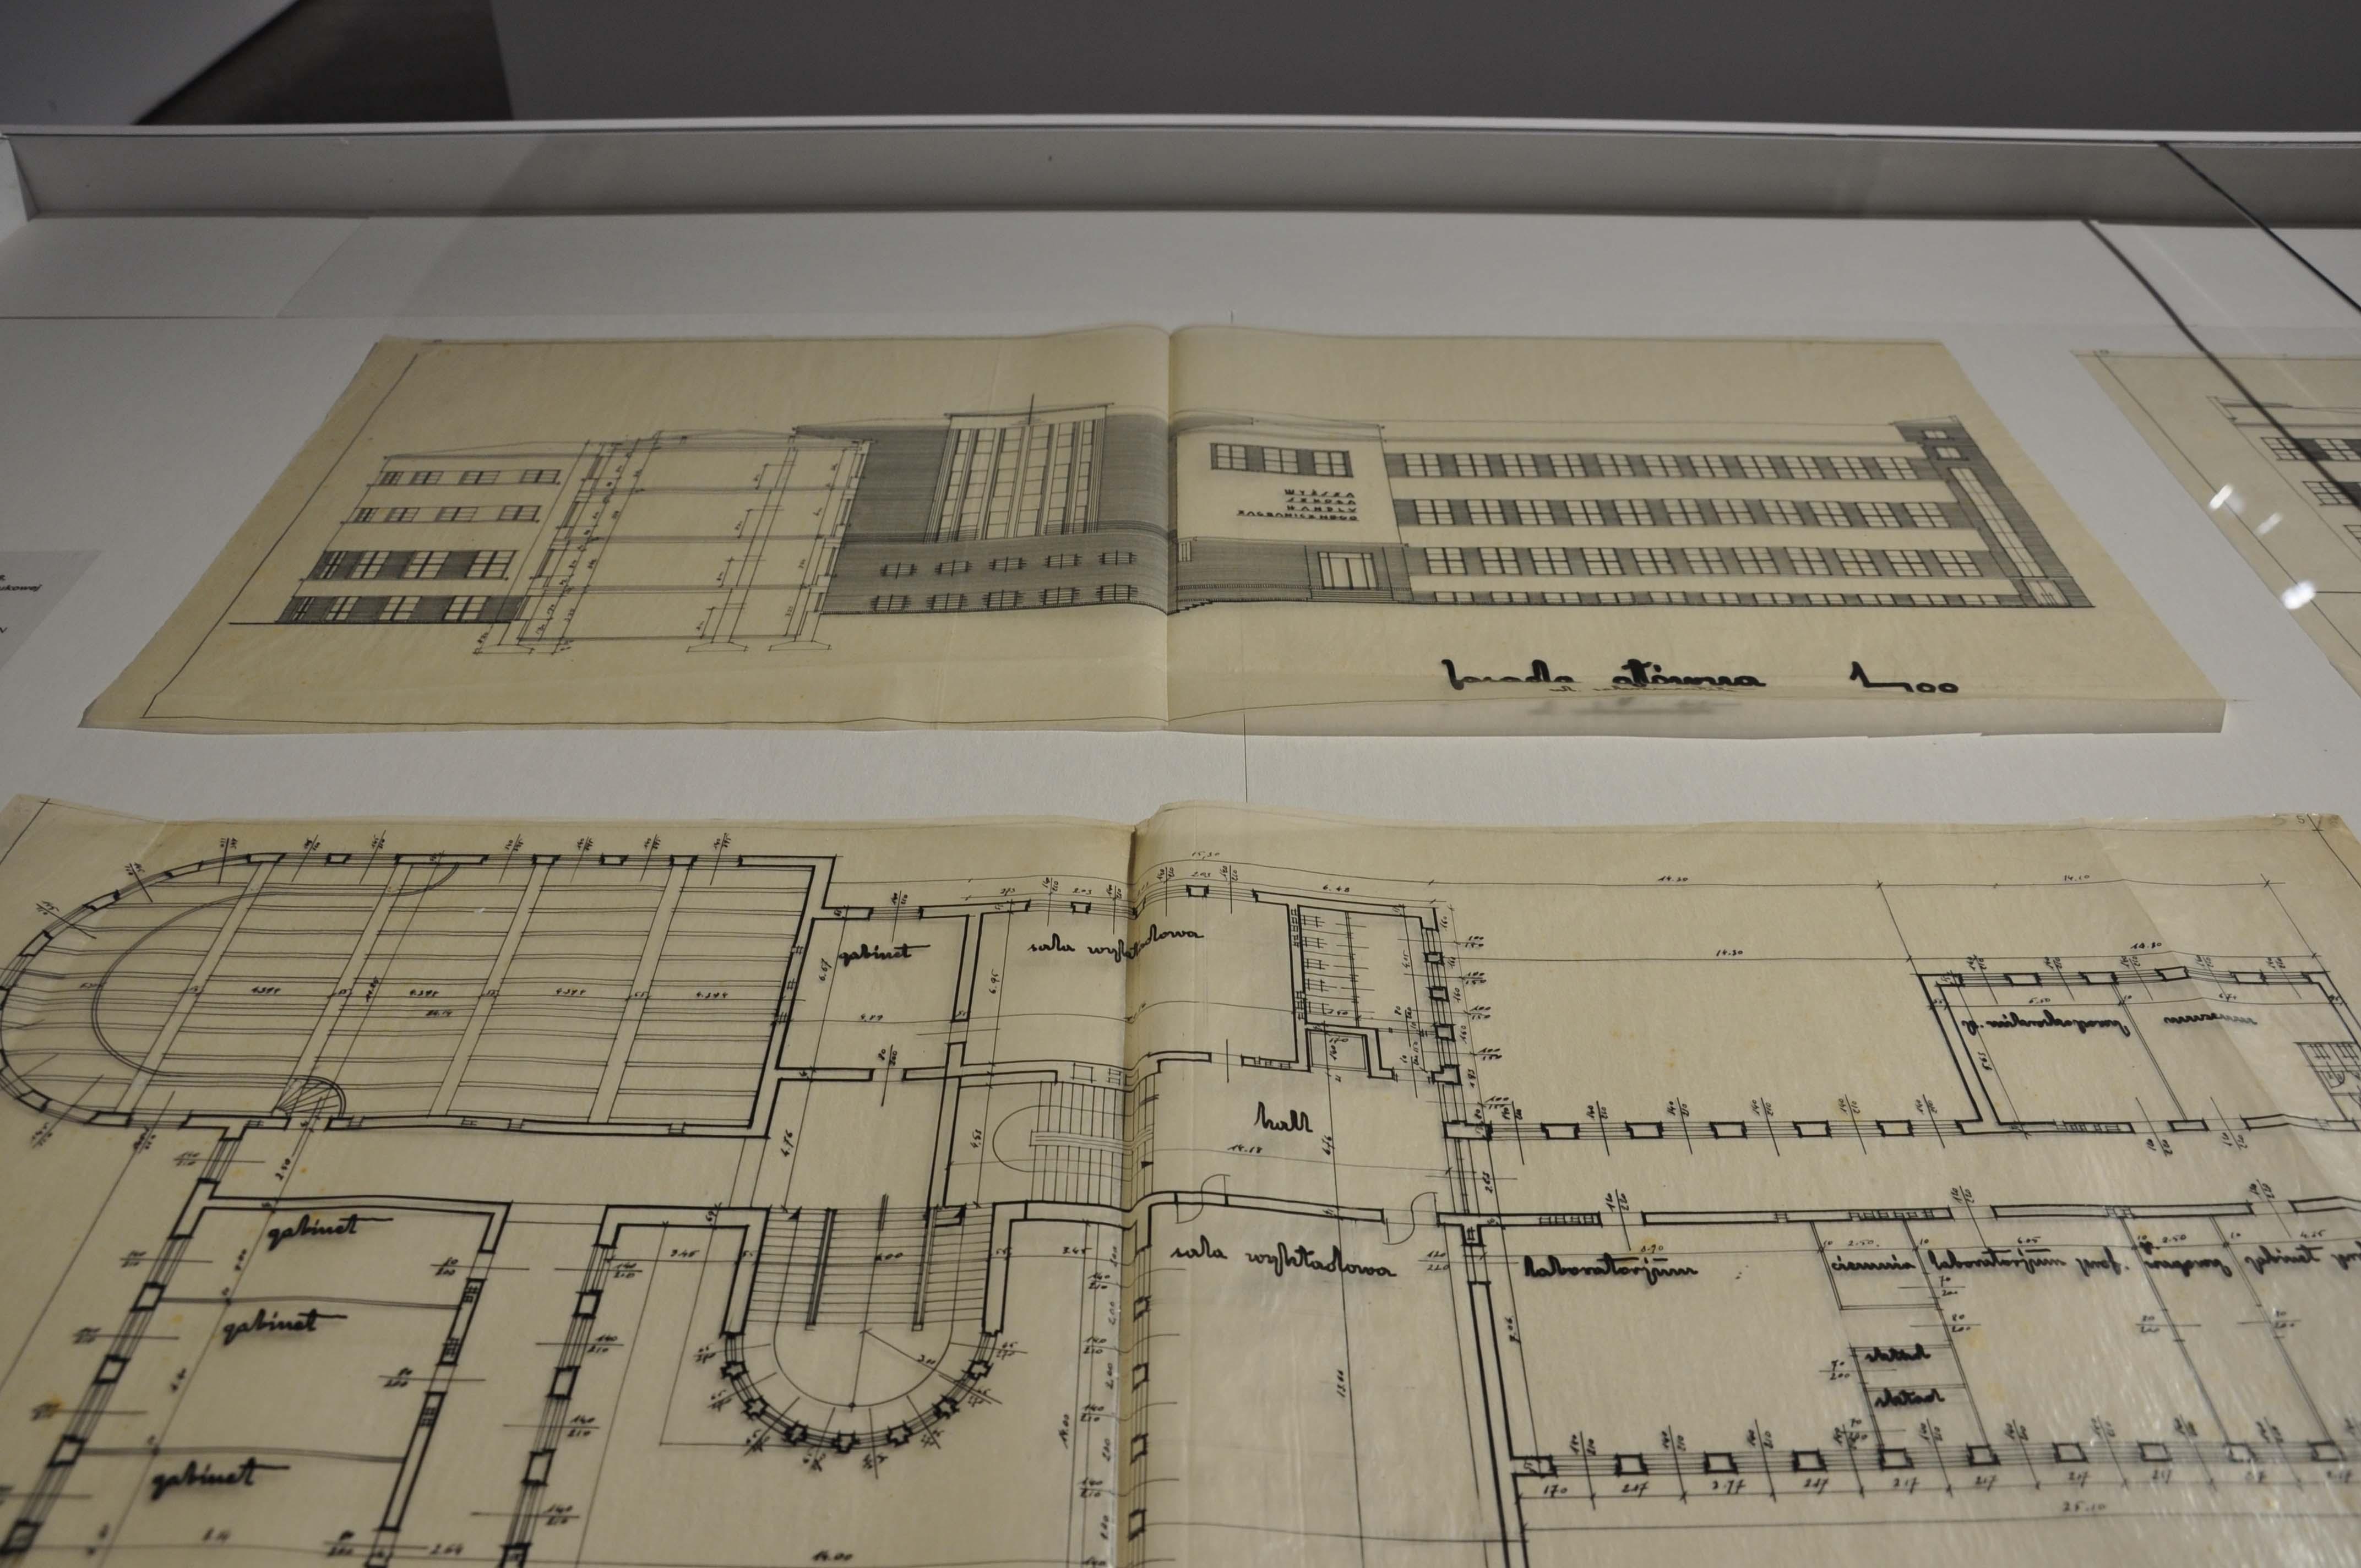 Креслення будинку. Фото з виставки Lwów 24 czerwca 1937. Miasto, architektura, modernizm